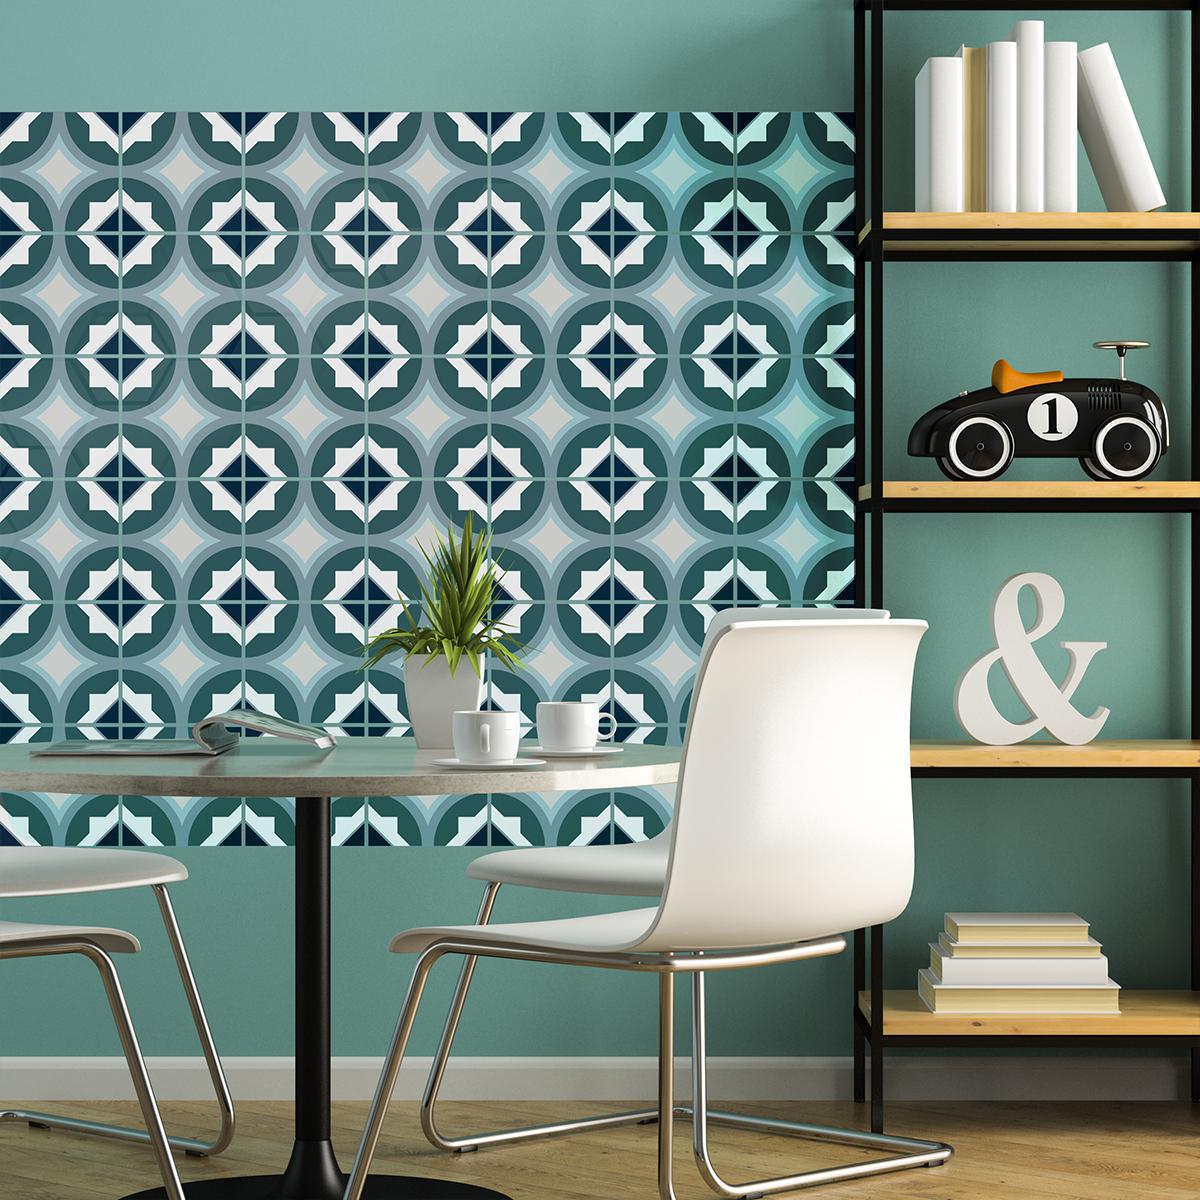 60 stickers carreaux de ciment azulejos estela cuisine. Black Bedroom Furniture Sets. Home Design Ideas